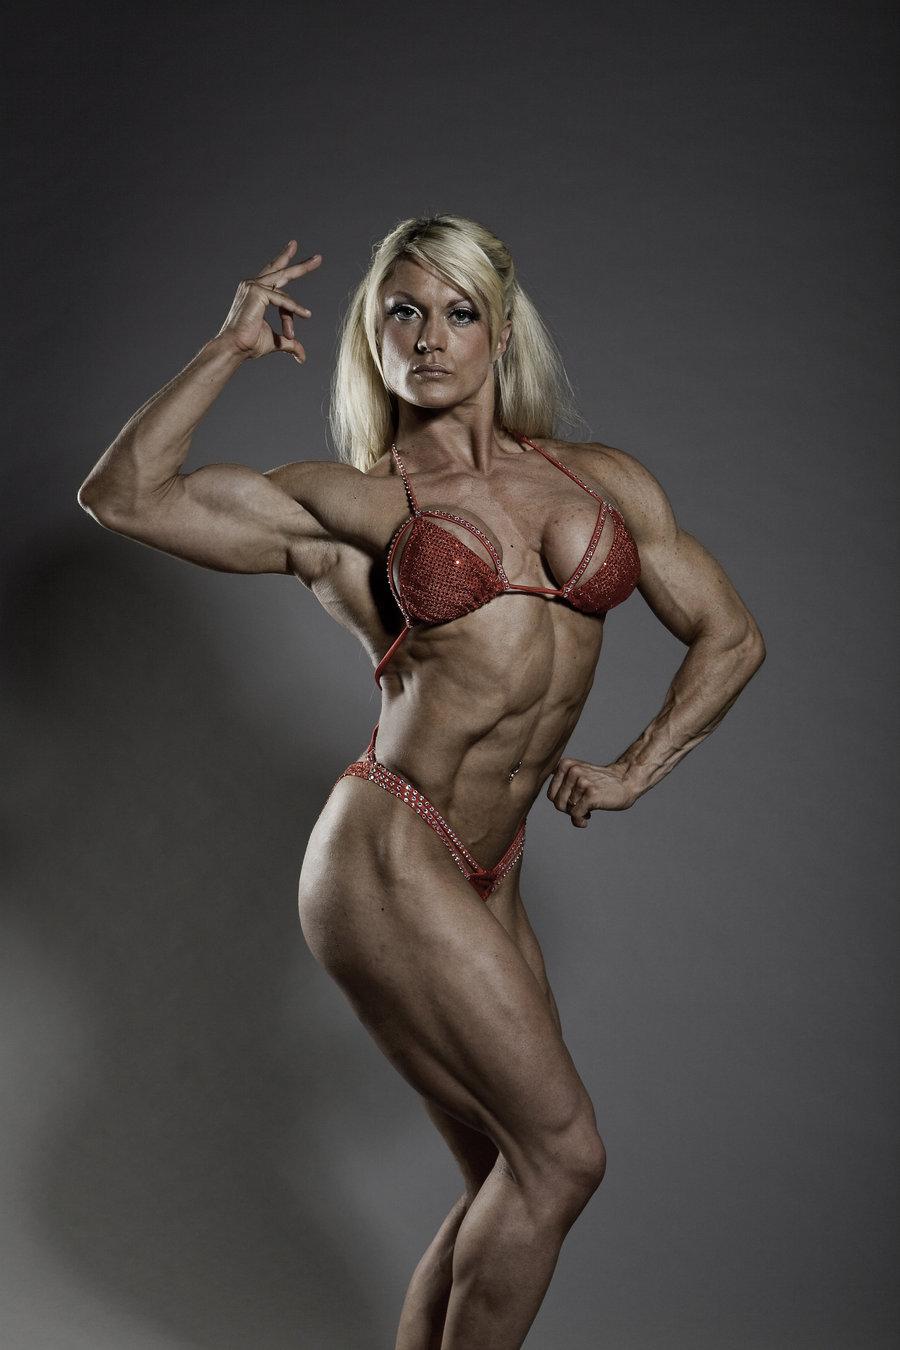 huge female bodybuilder lisa cross flexing her muscles